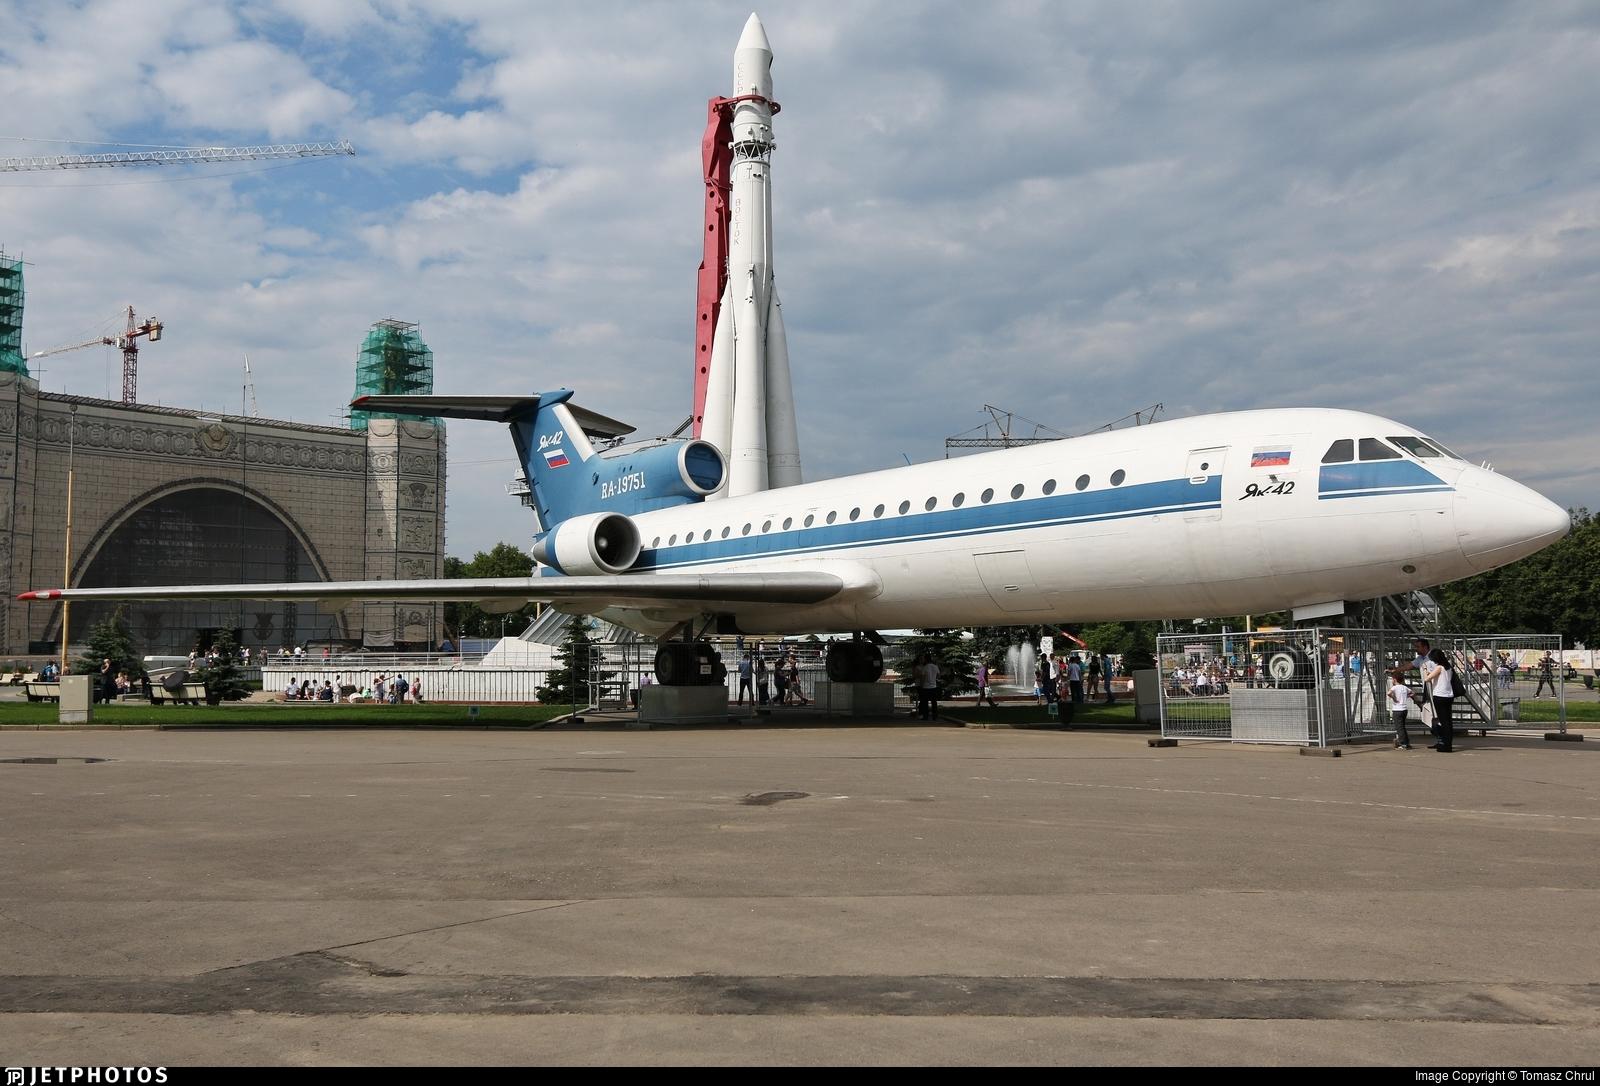 RA-19751 - Yakovlev Yak-42 - Private